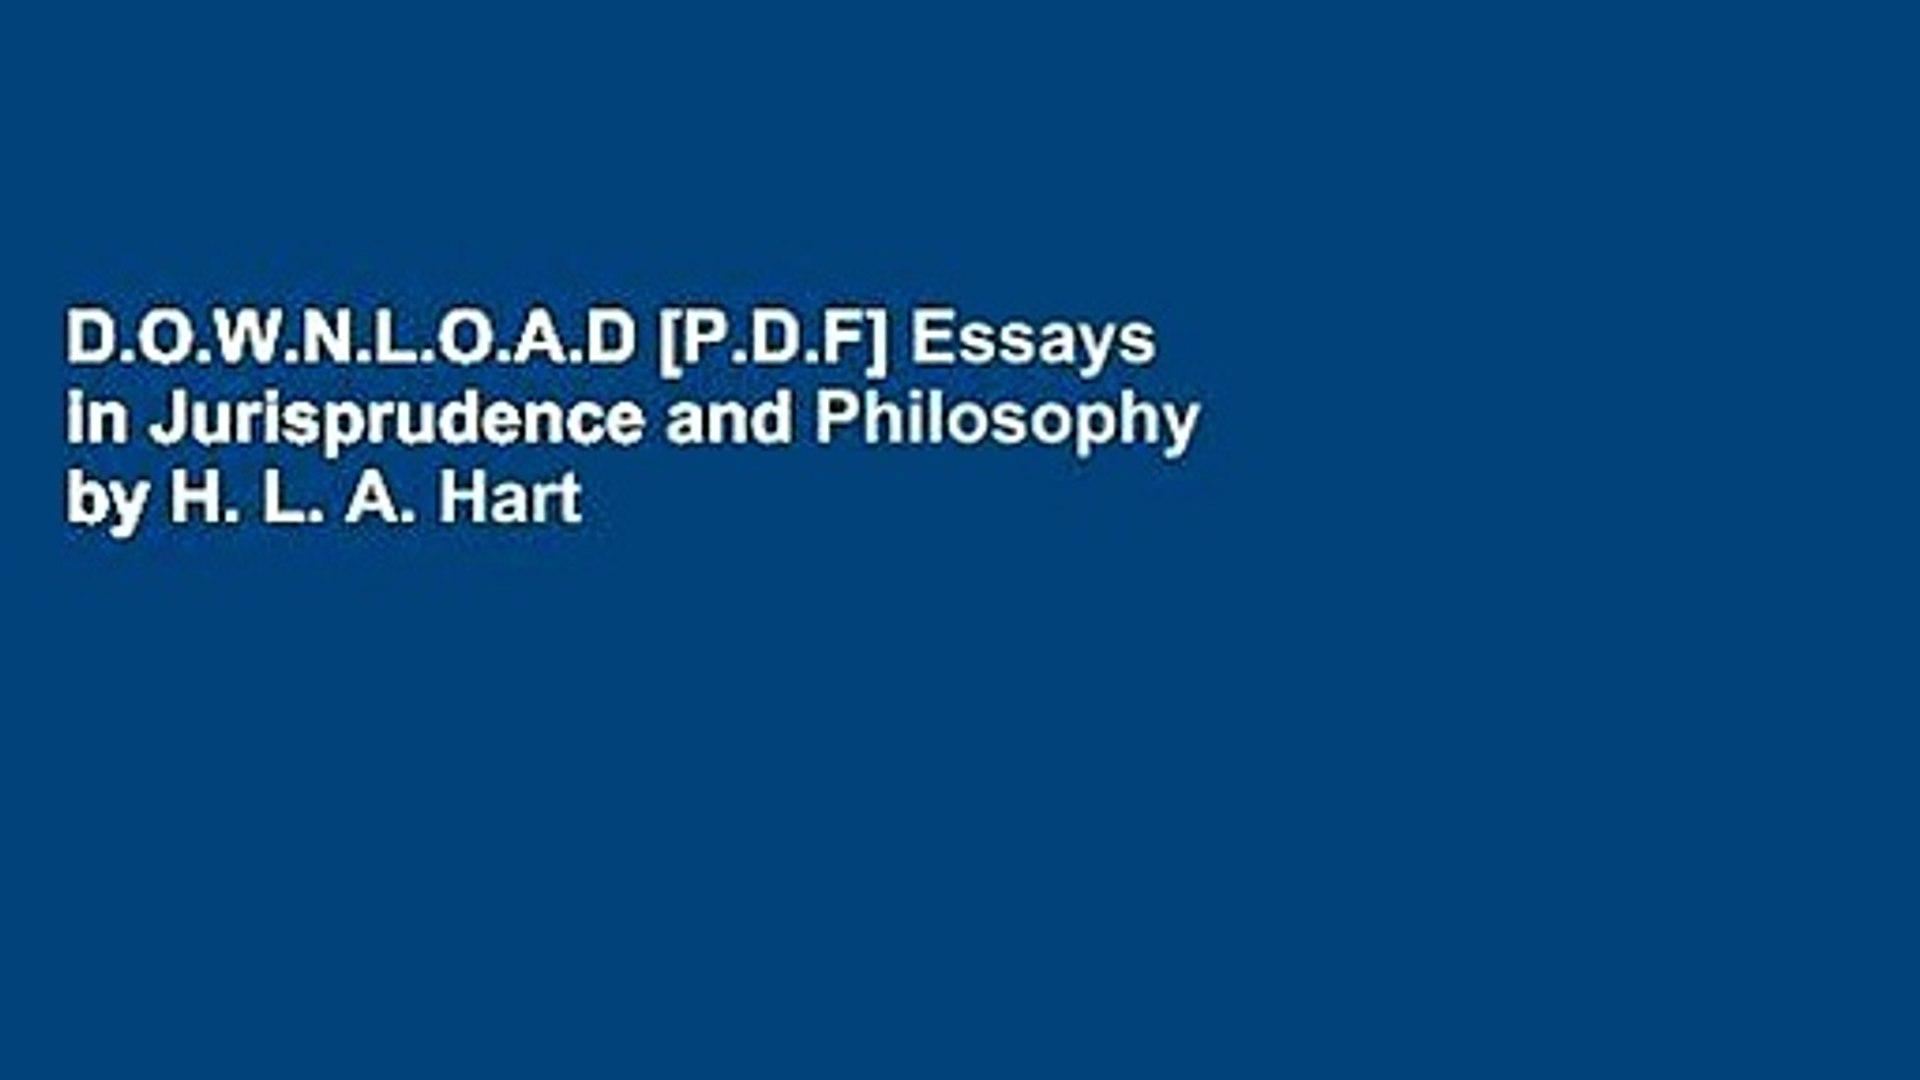 hart h essays in jurisprudence and philosophy pdf